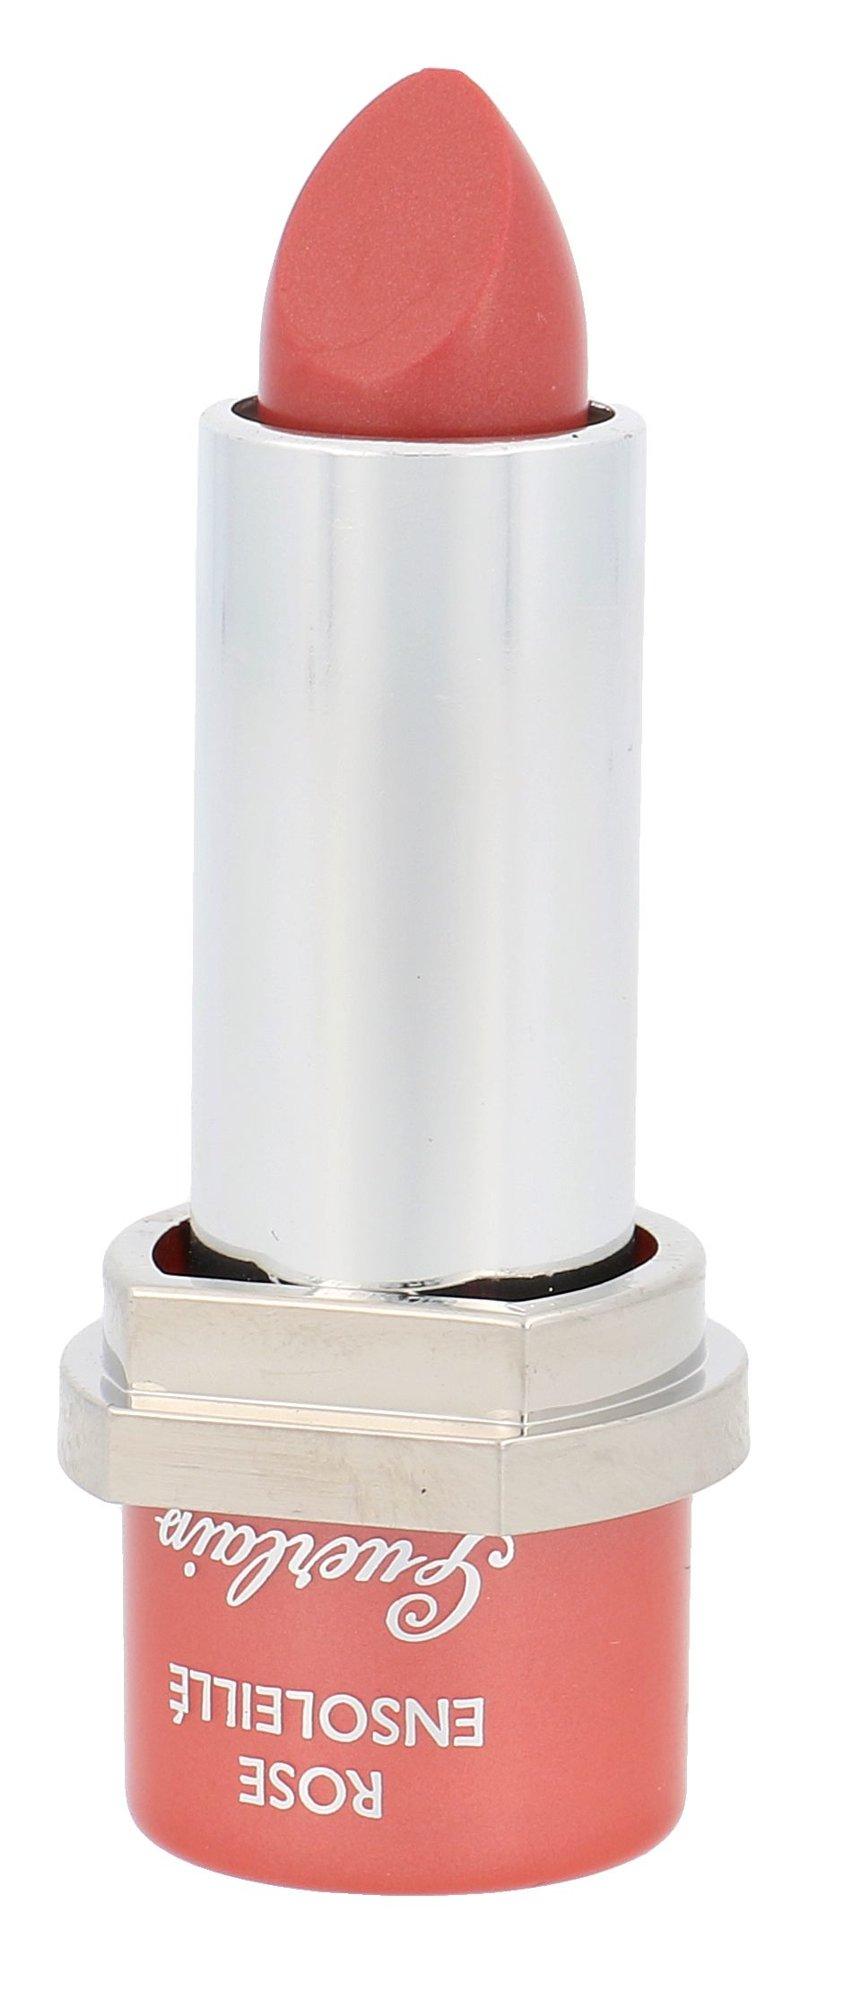 Guerlain Rouge G De Guerlain Cosmetic 3,5ml 73 Rose Ensoleillé